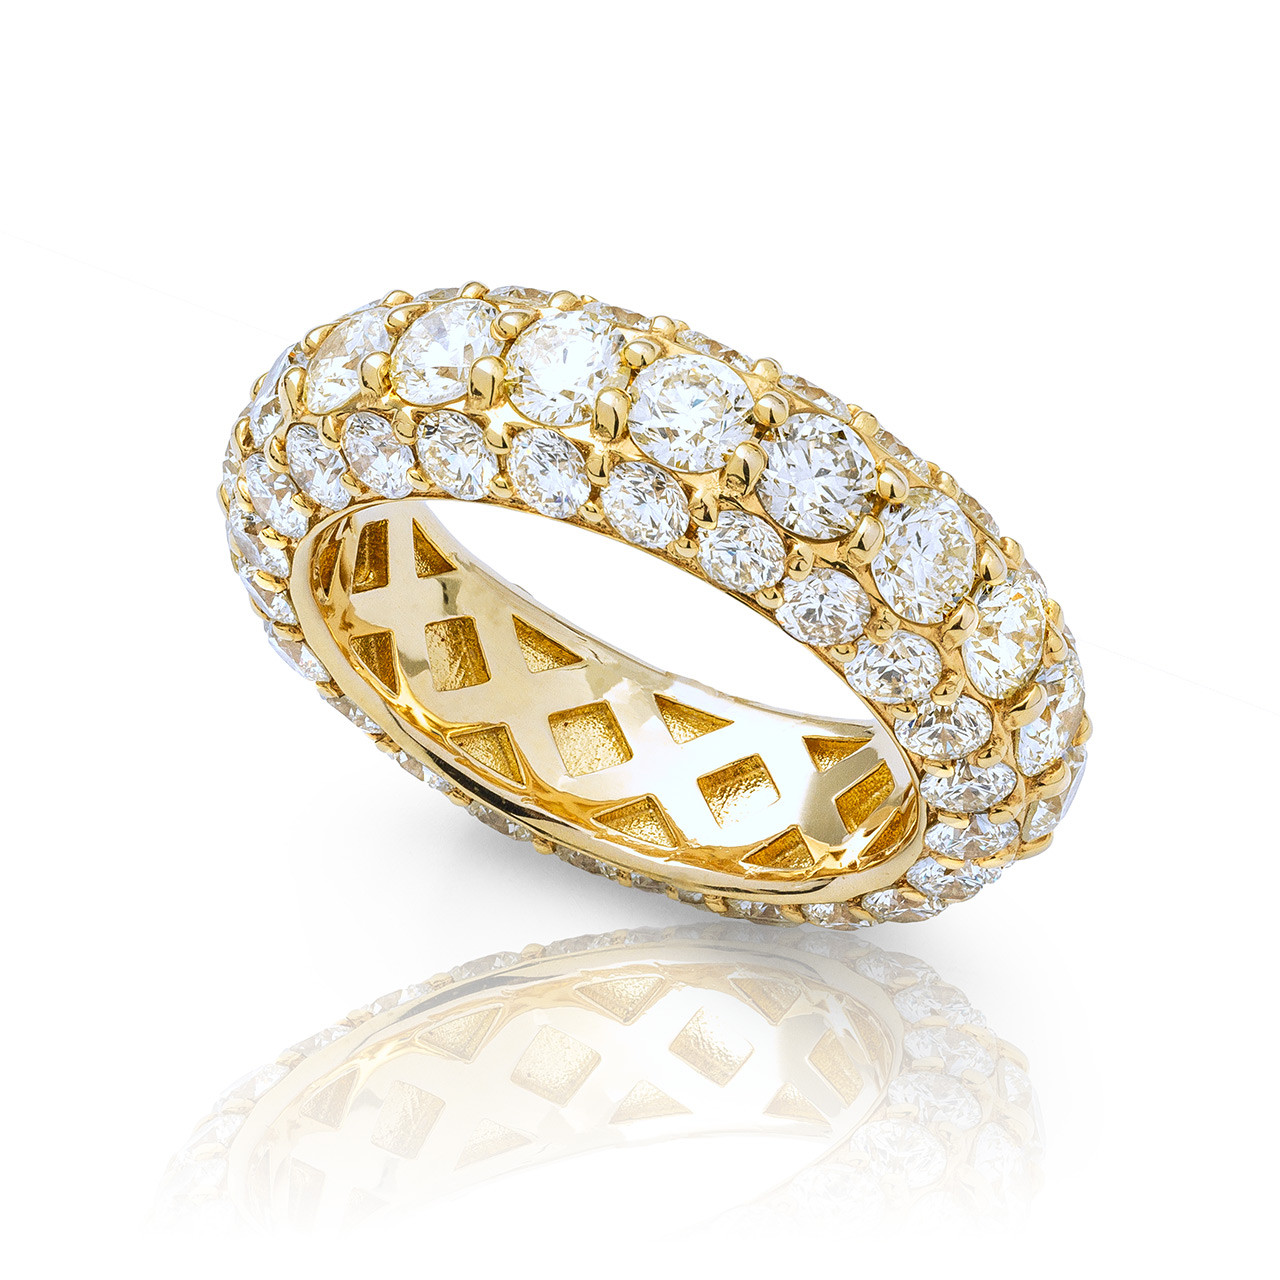 f1b93f2cd3c59 14K Yellow Gold 8.77ct Diamond Single Row Eternity Band